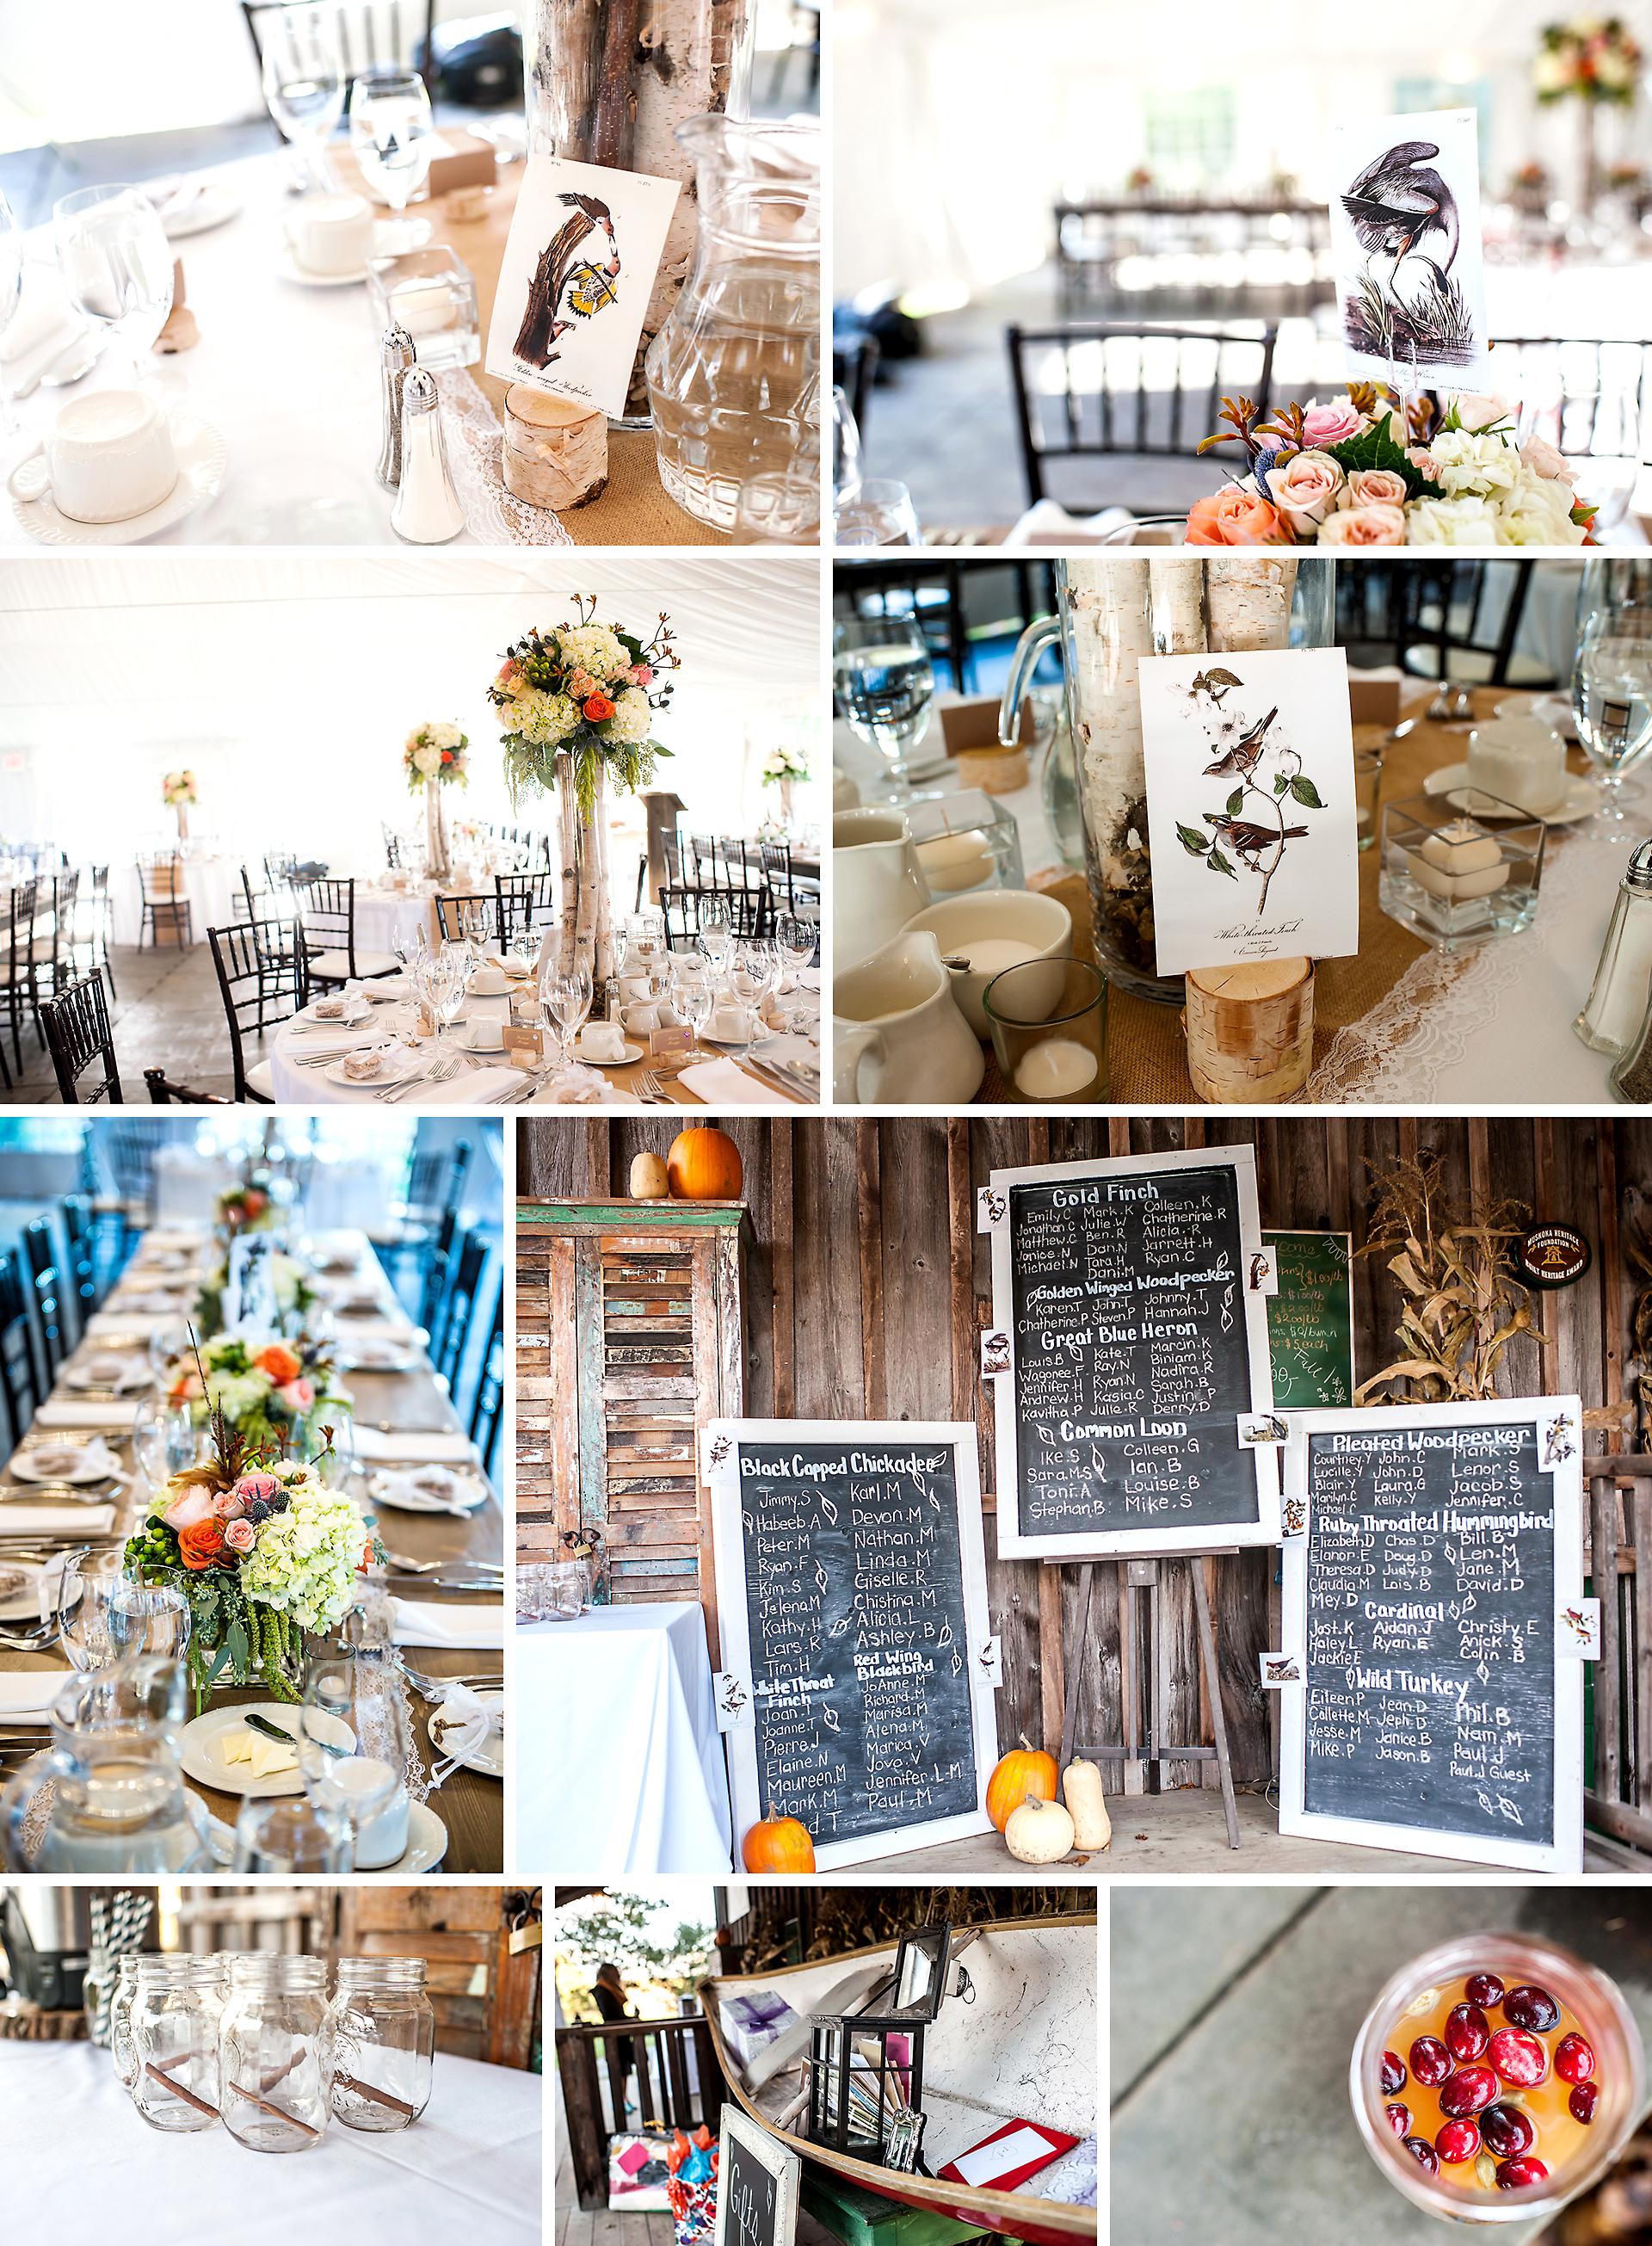 Nathan & Linda | Brooksfield Farms Wedding | Muskoka Wedding Photography32